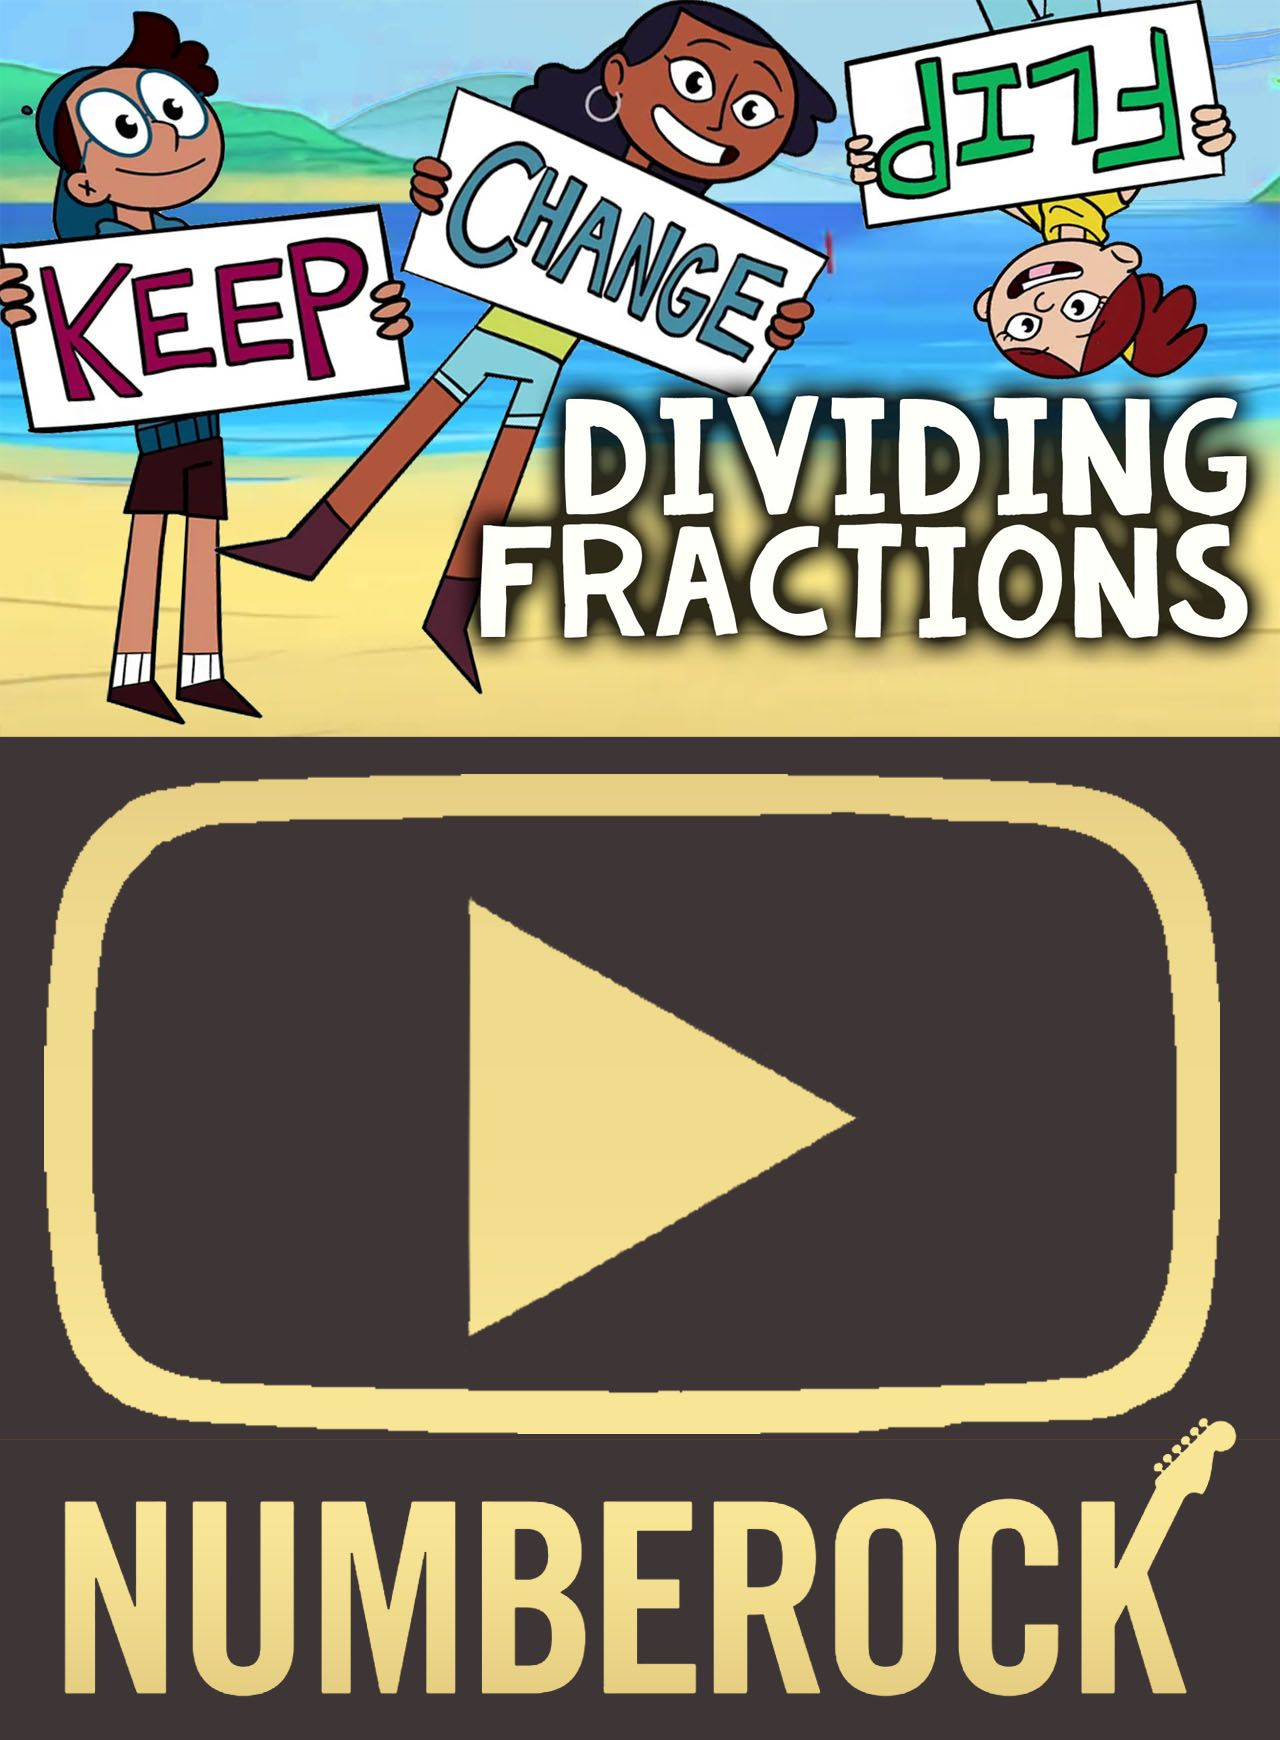 Keep Change Flip Video